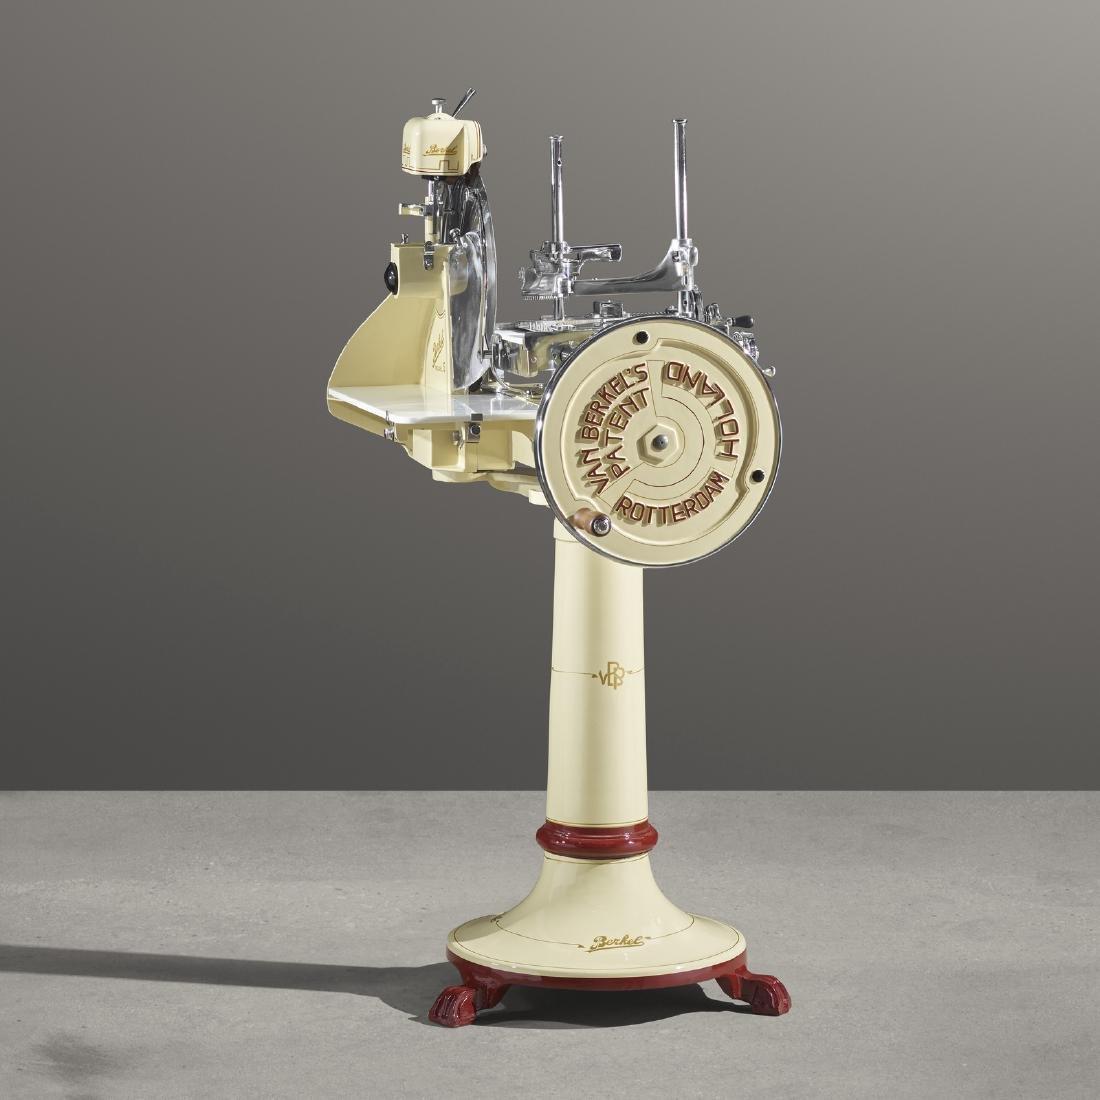 Berkel, Flywheel slicer, model 5